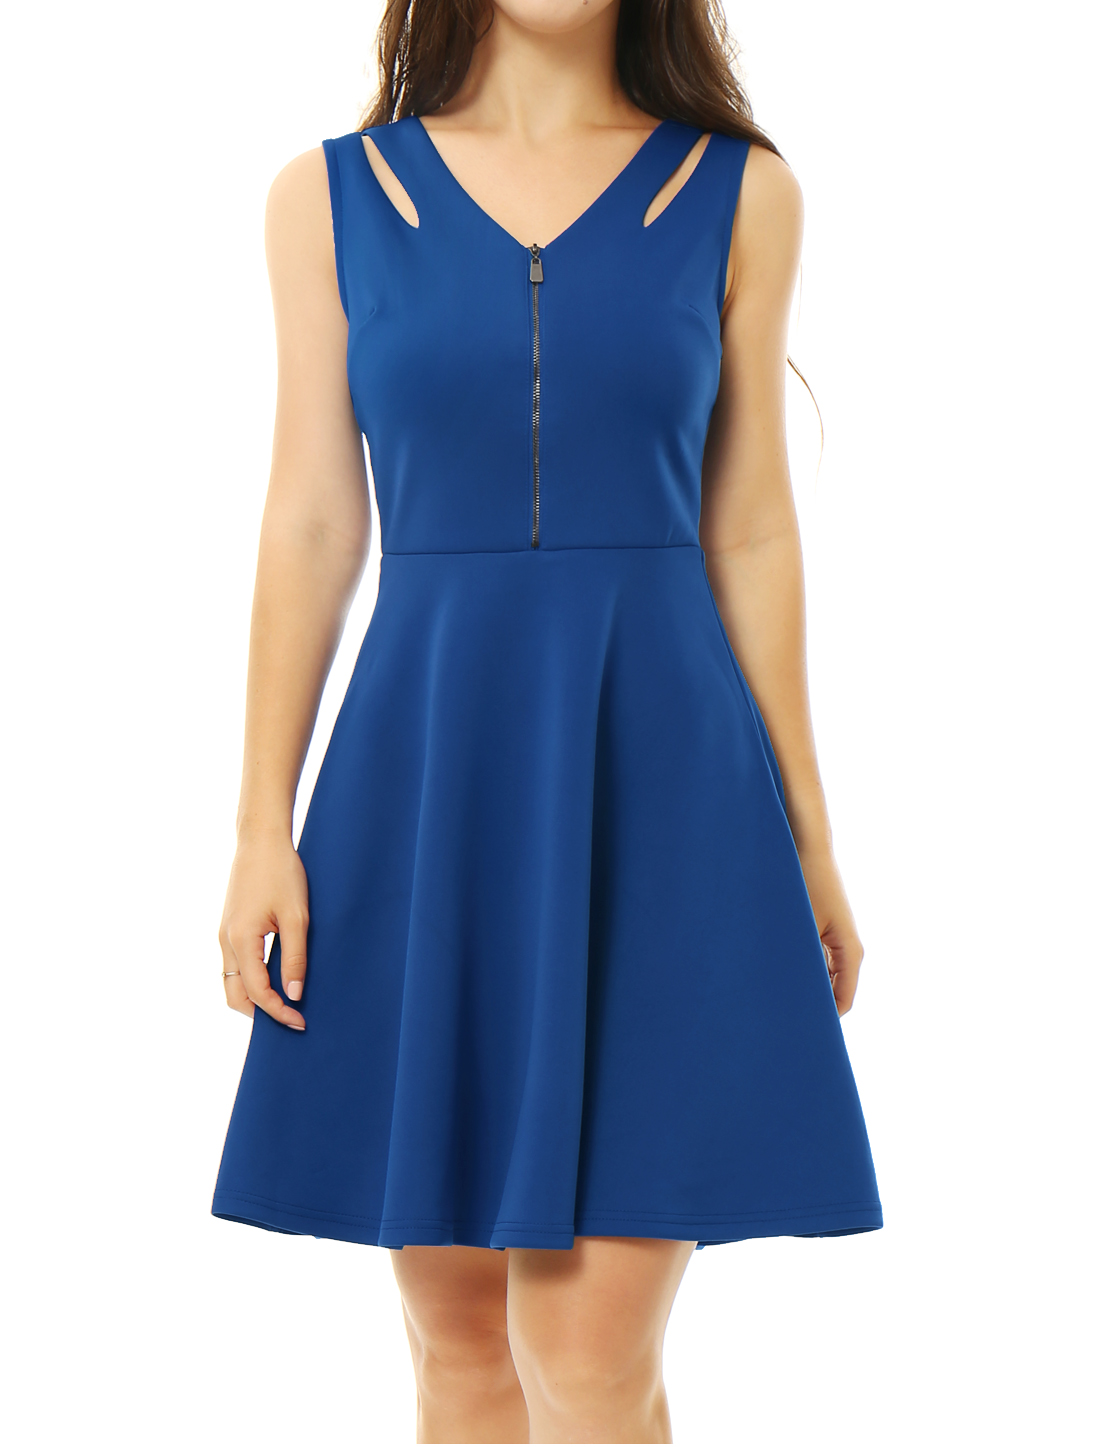 Women V Neck Half Zipper Front Cut Out A Line Dress Blue S